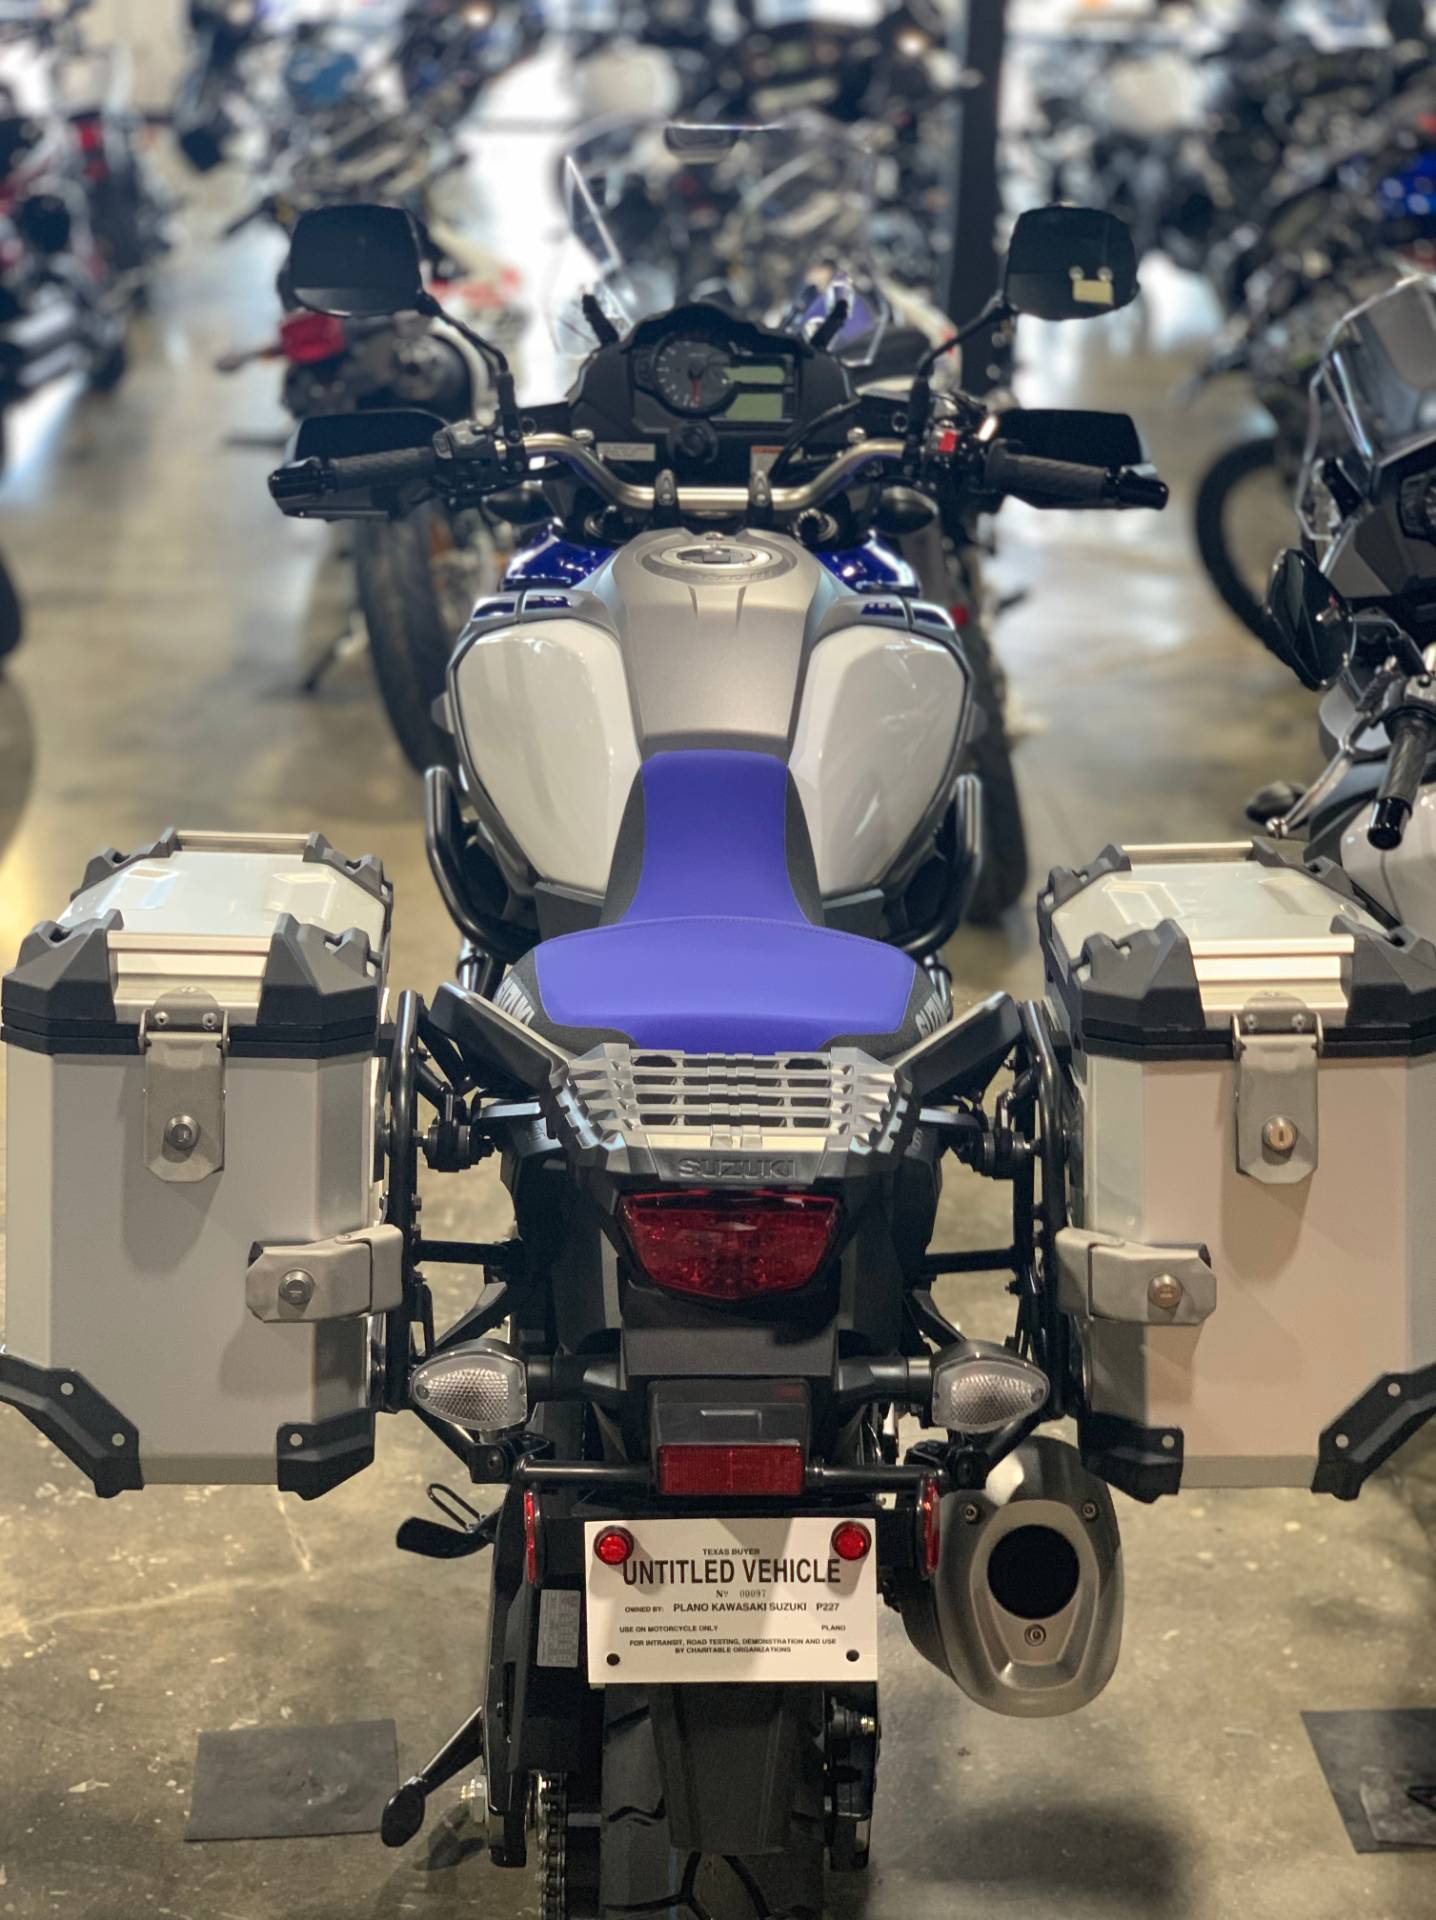 2019 Suzuki V-Strom 1000XT Adventure in Plano, Texas